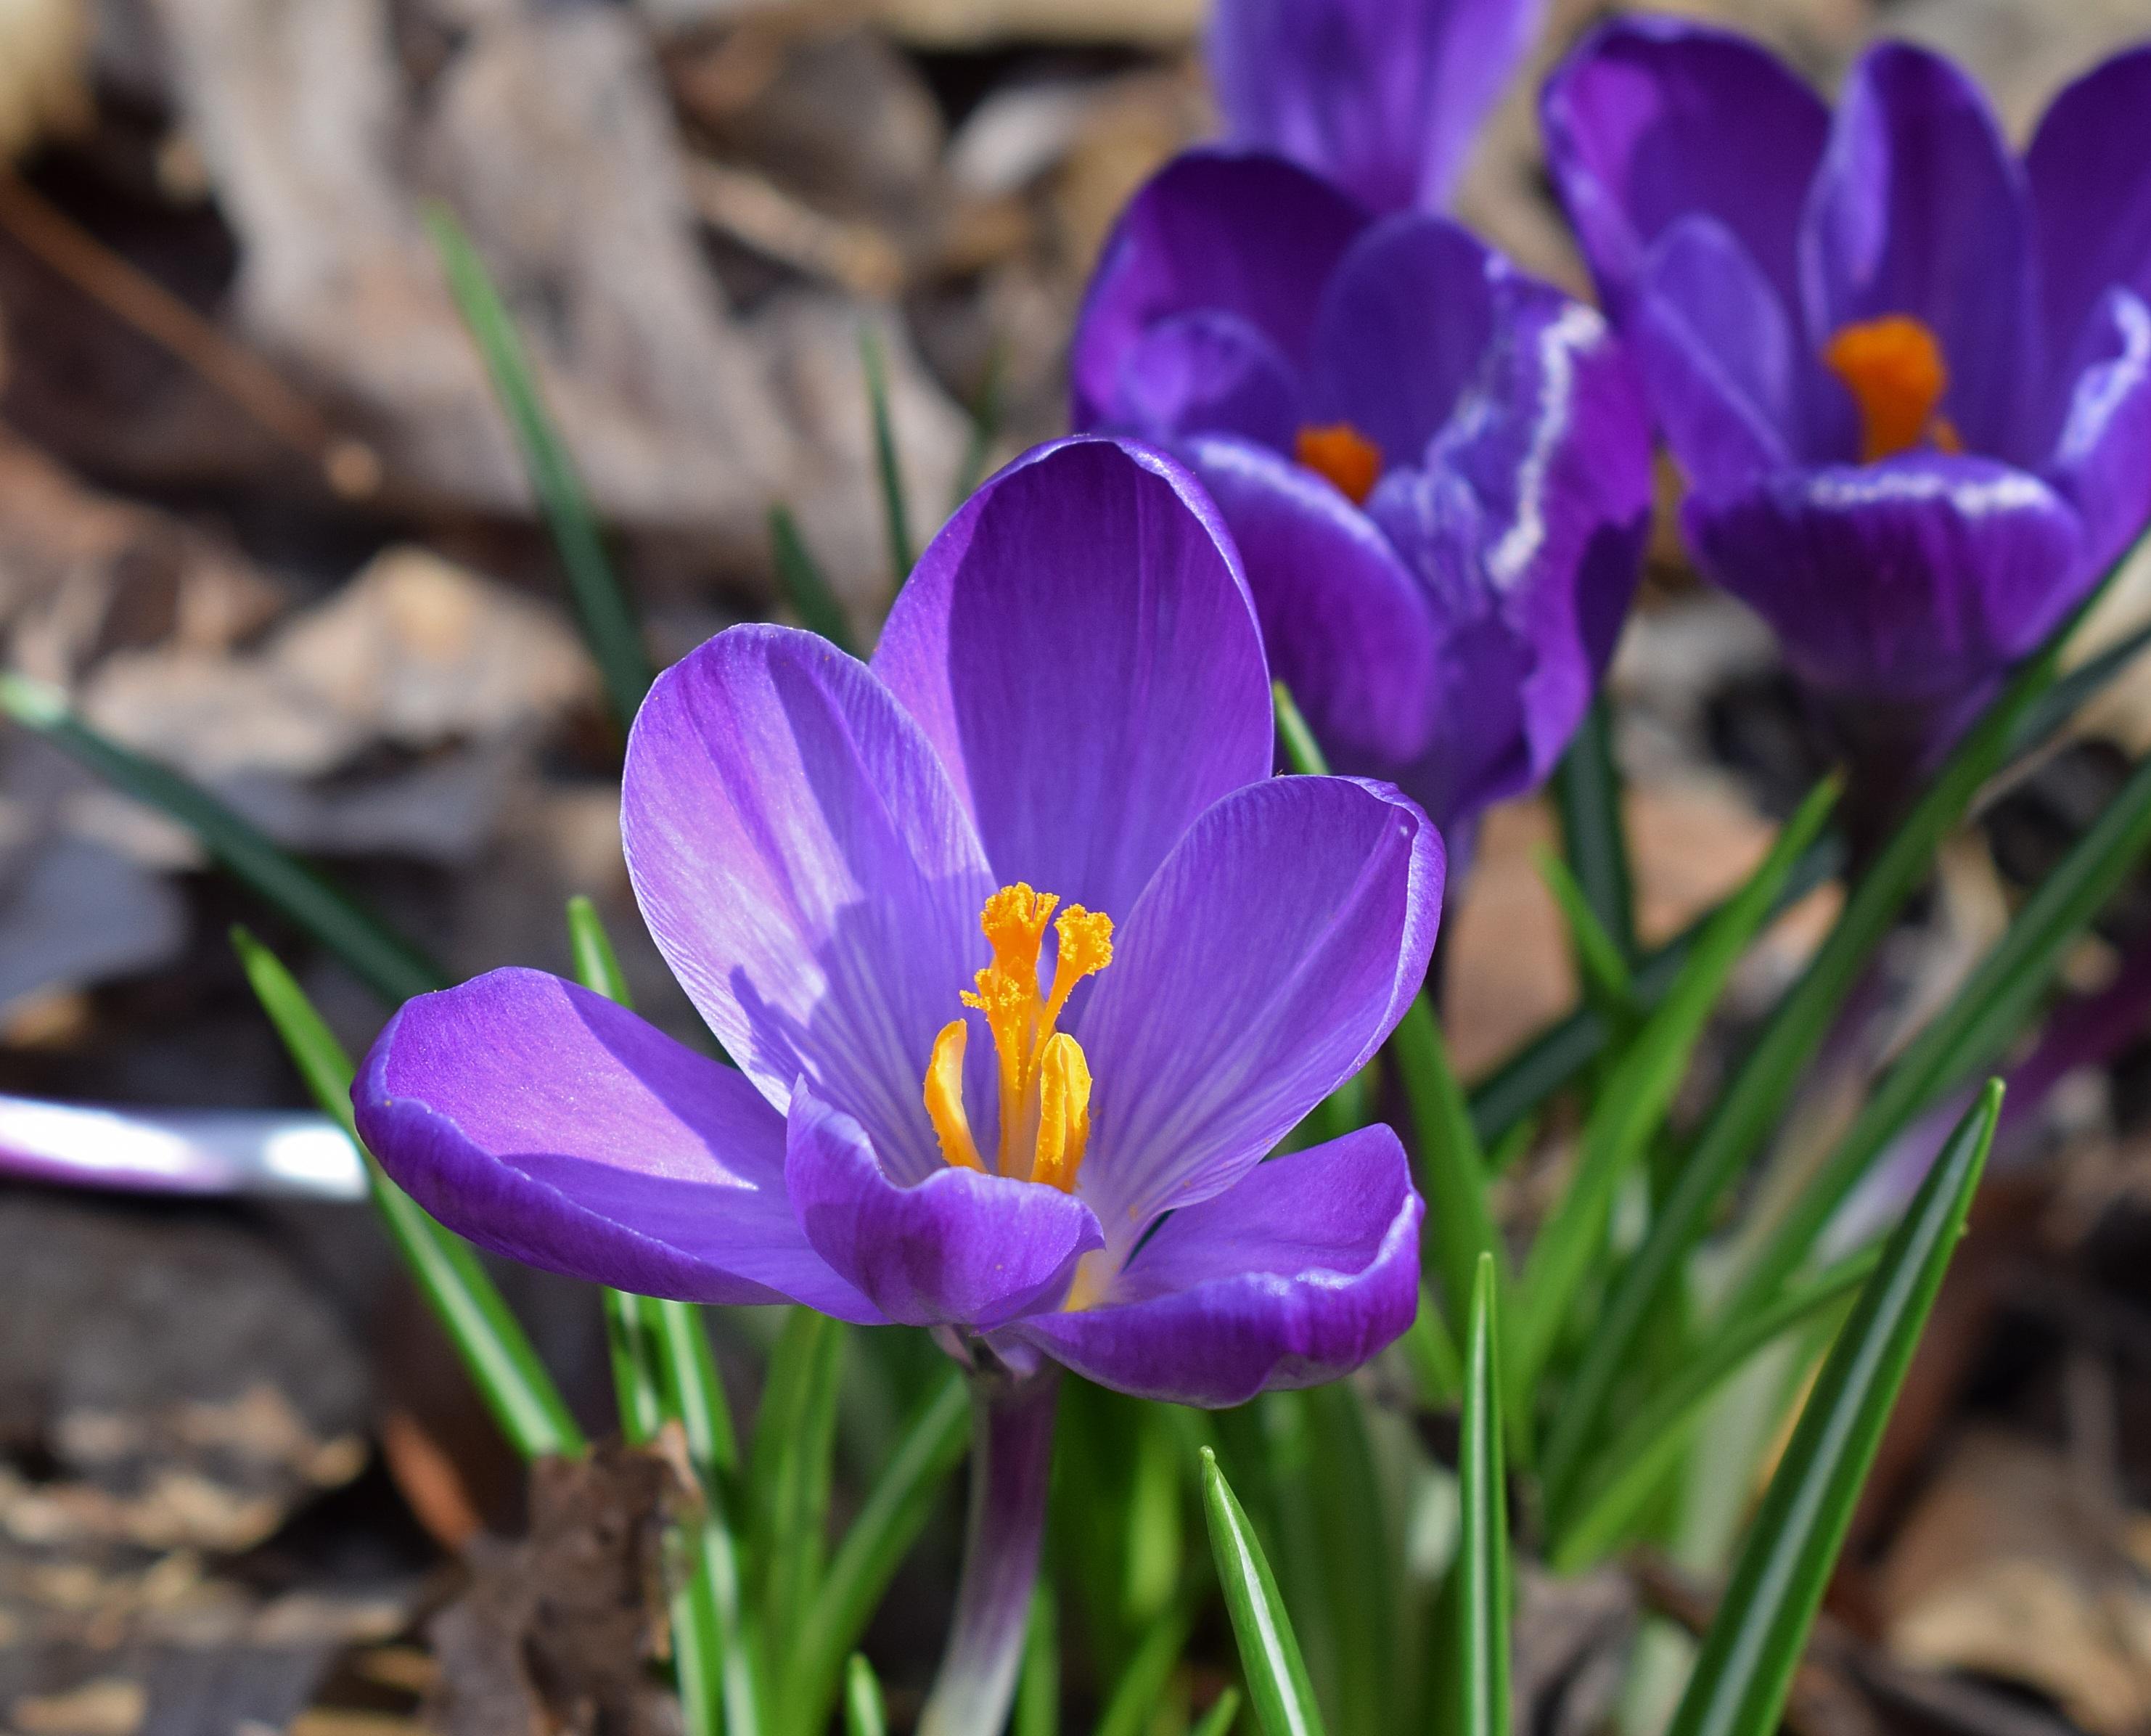 Free Images Nature Blossom Flower Purple Petal Bloom Spring